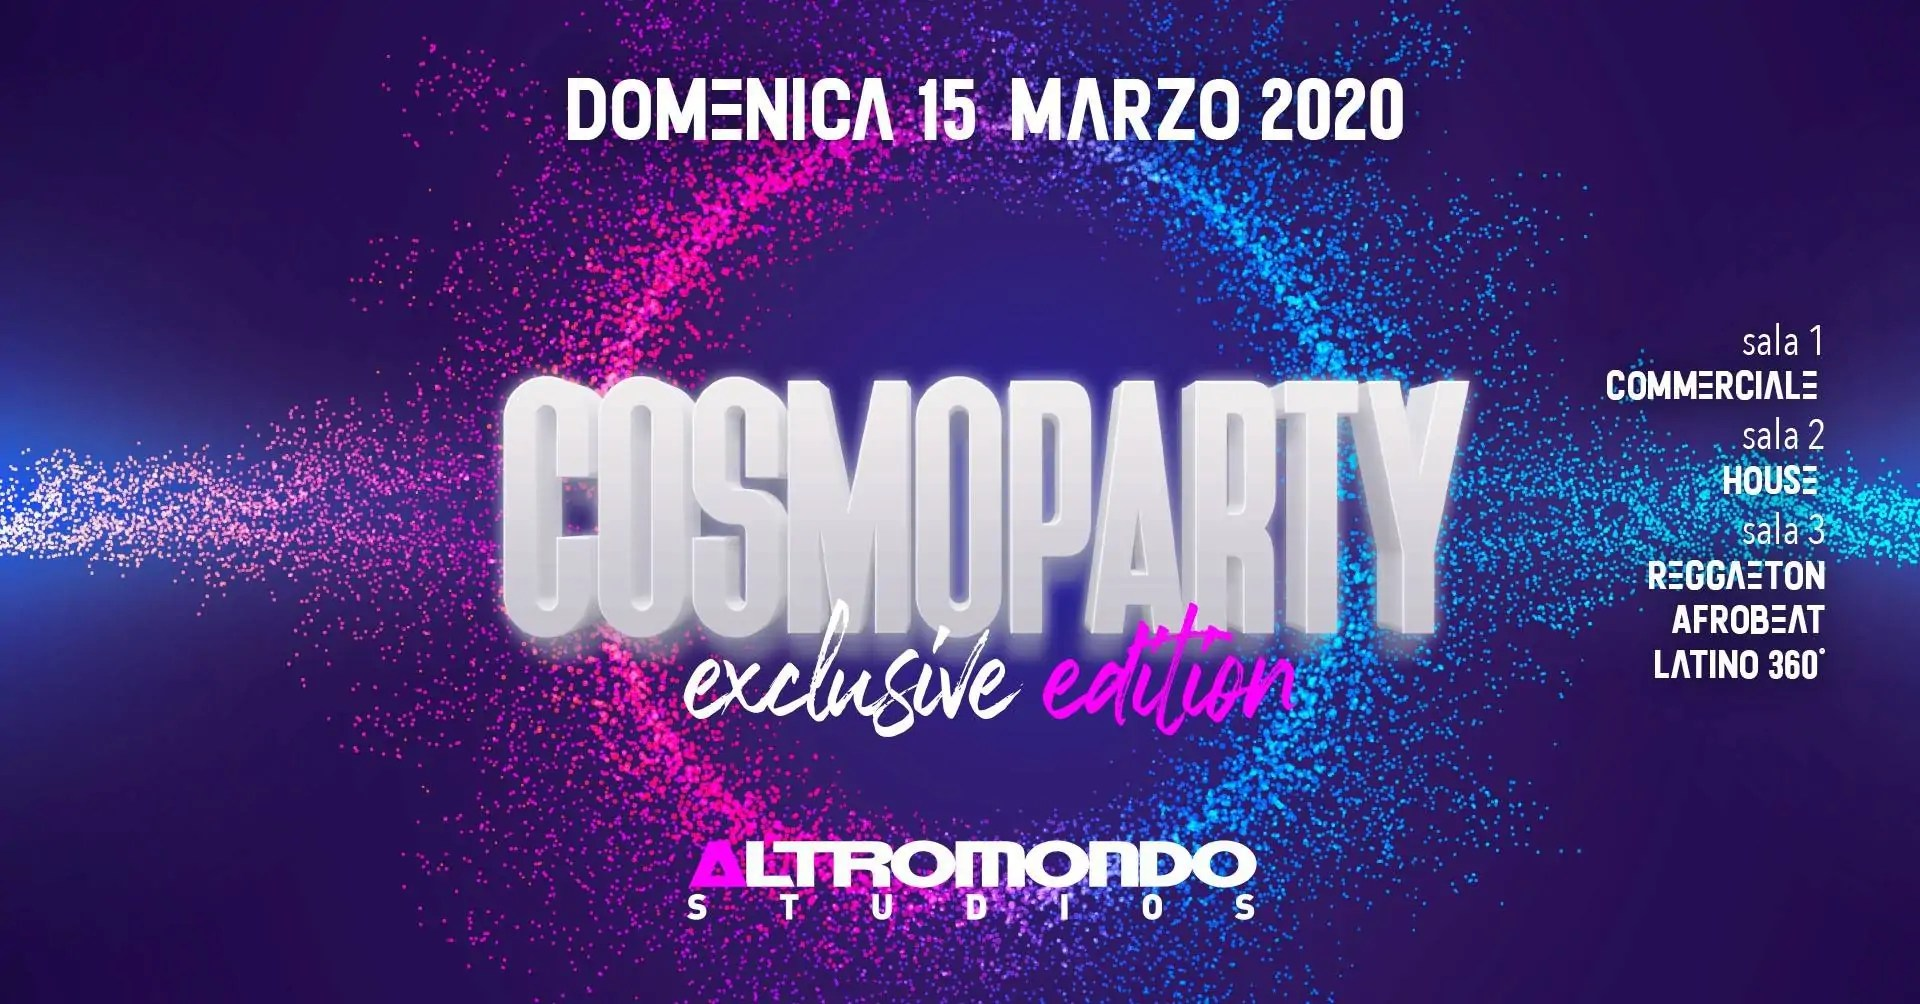 Cosmoparty 2020altromondo Studios Rimini